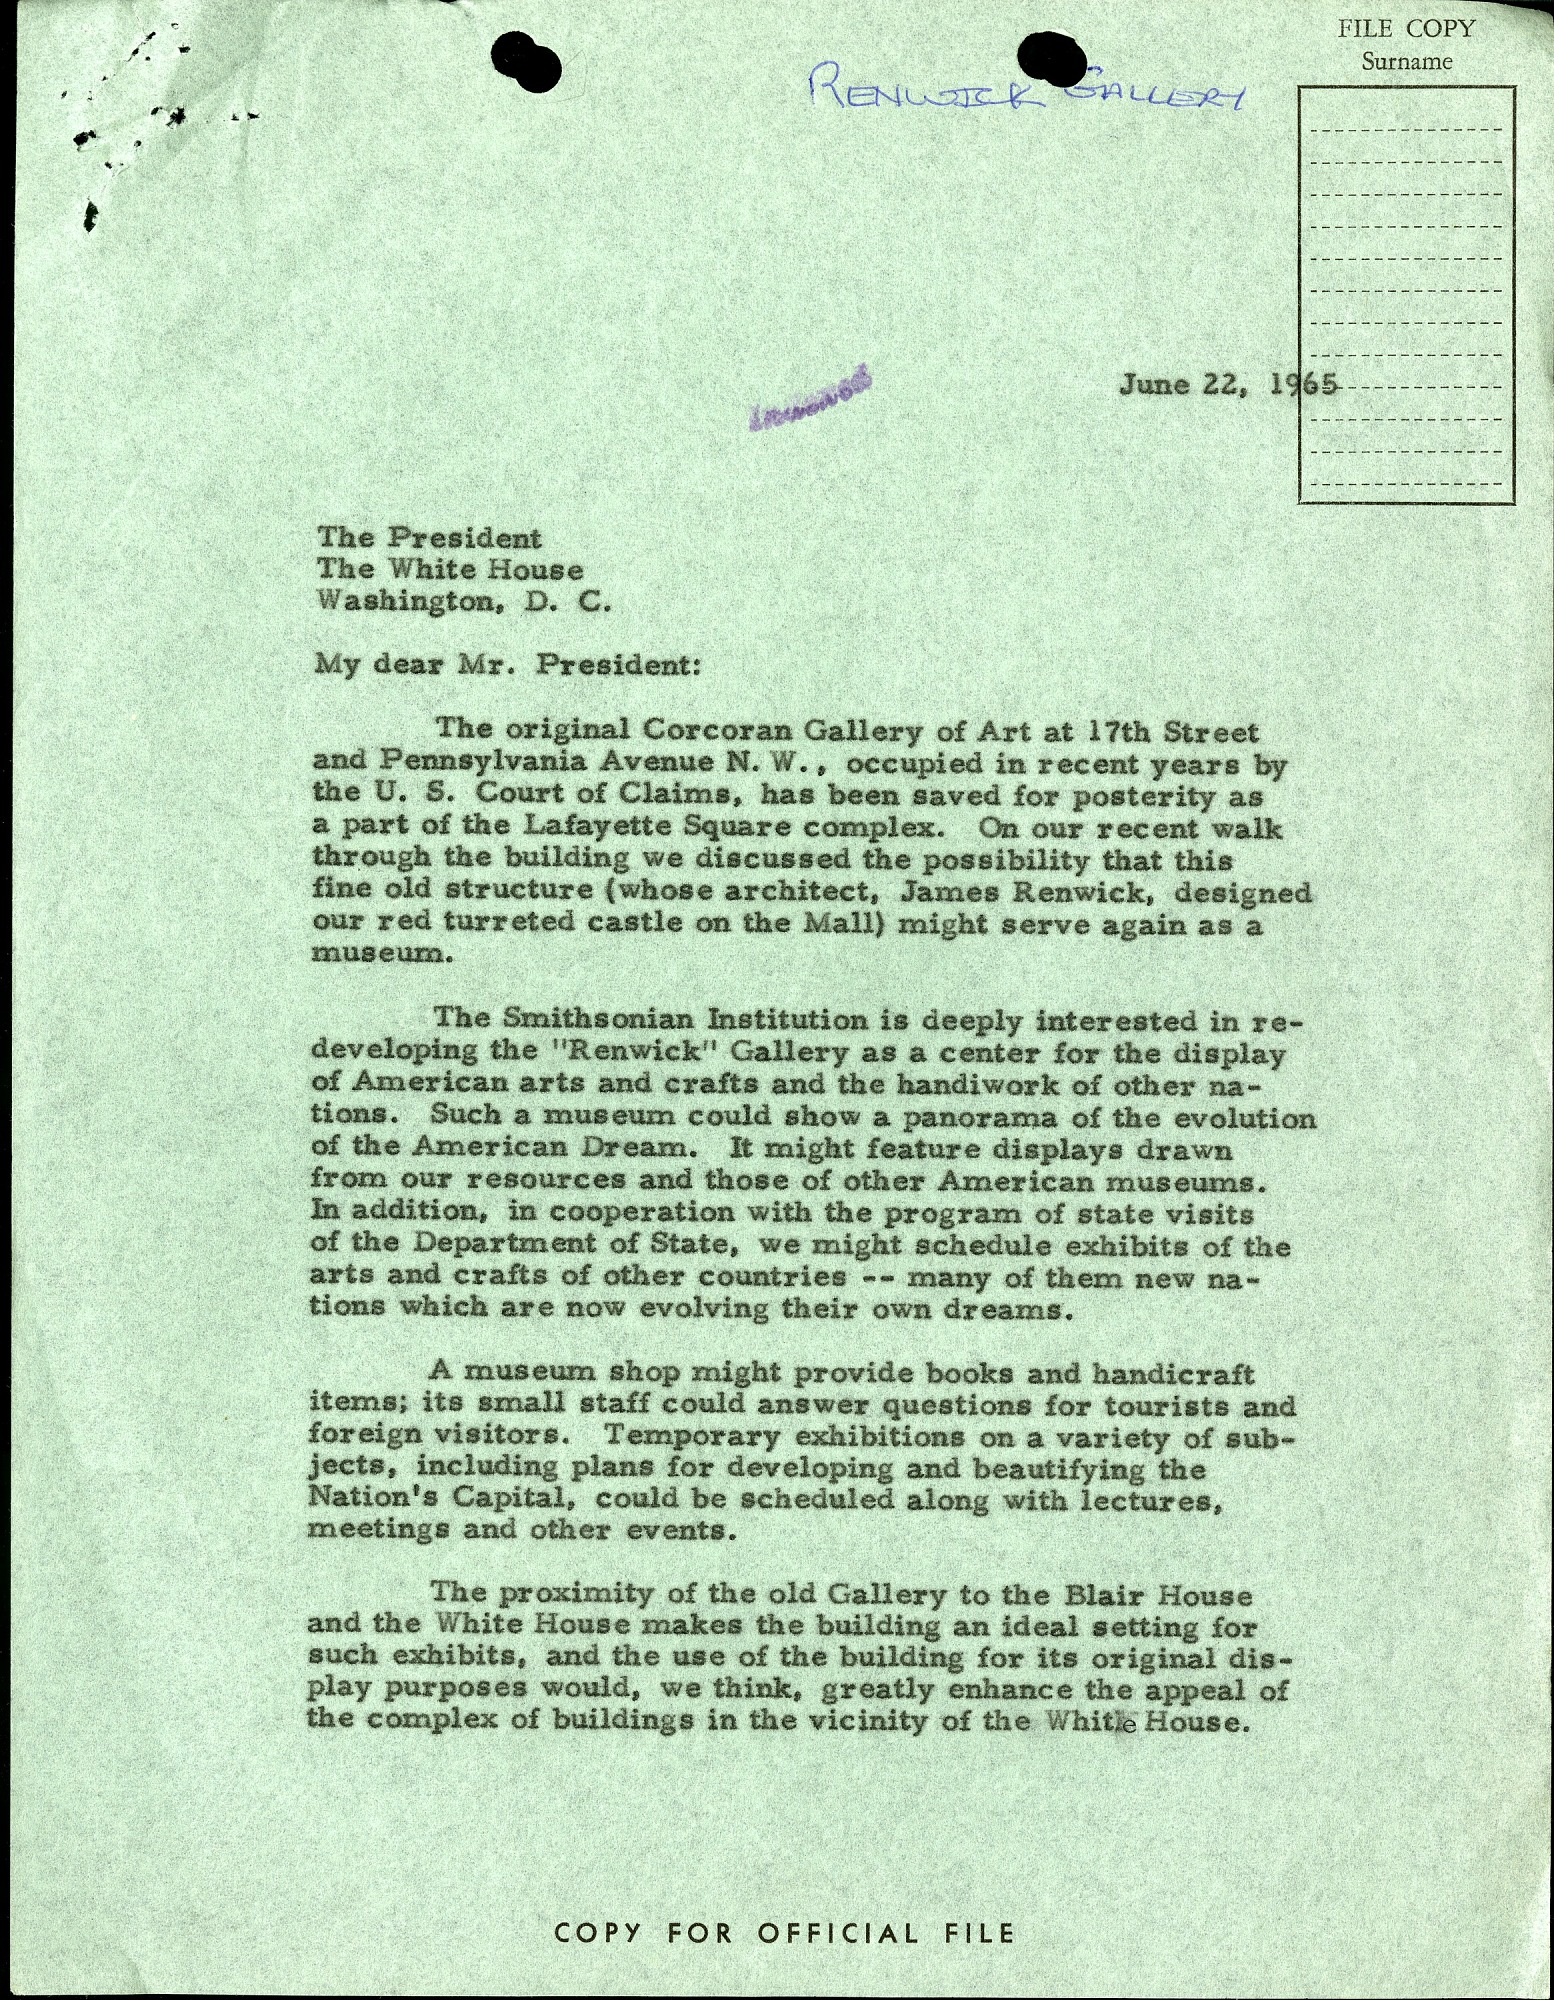 Letter S. D. Ripley to Lyndon Johnson, June 22, 1965